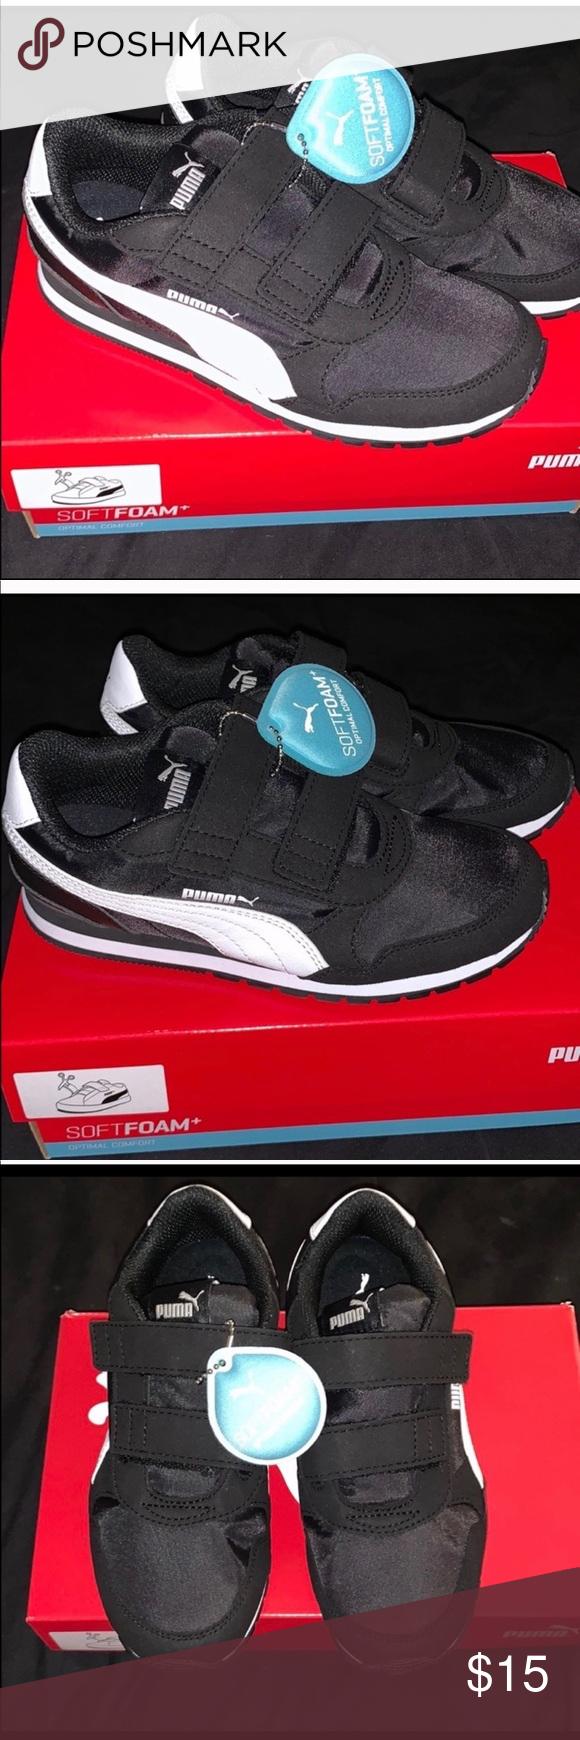 Puma Soft Foam Velcro kids 2c 2 Shoes